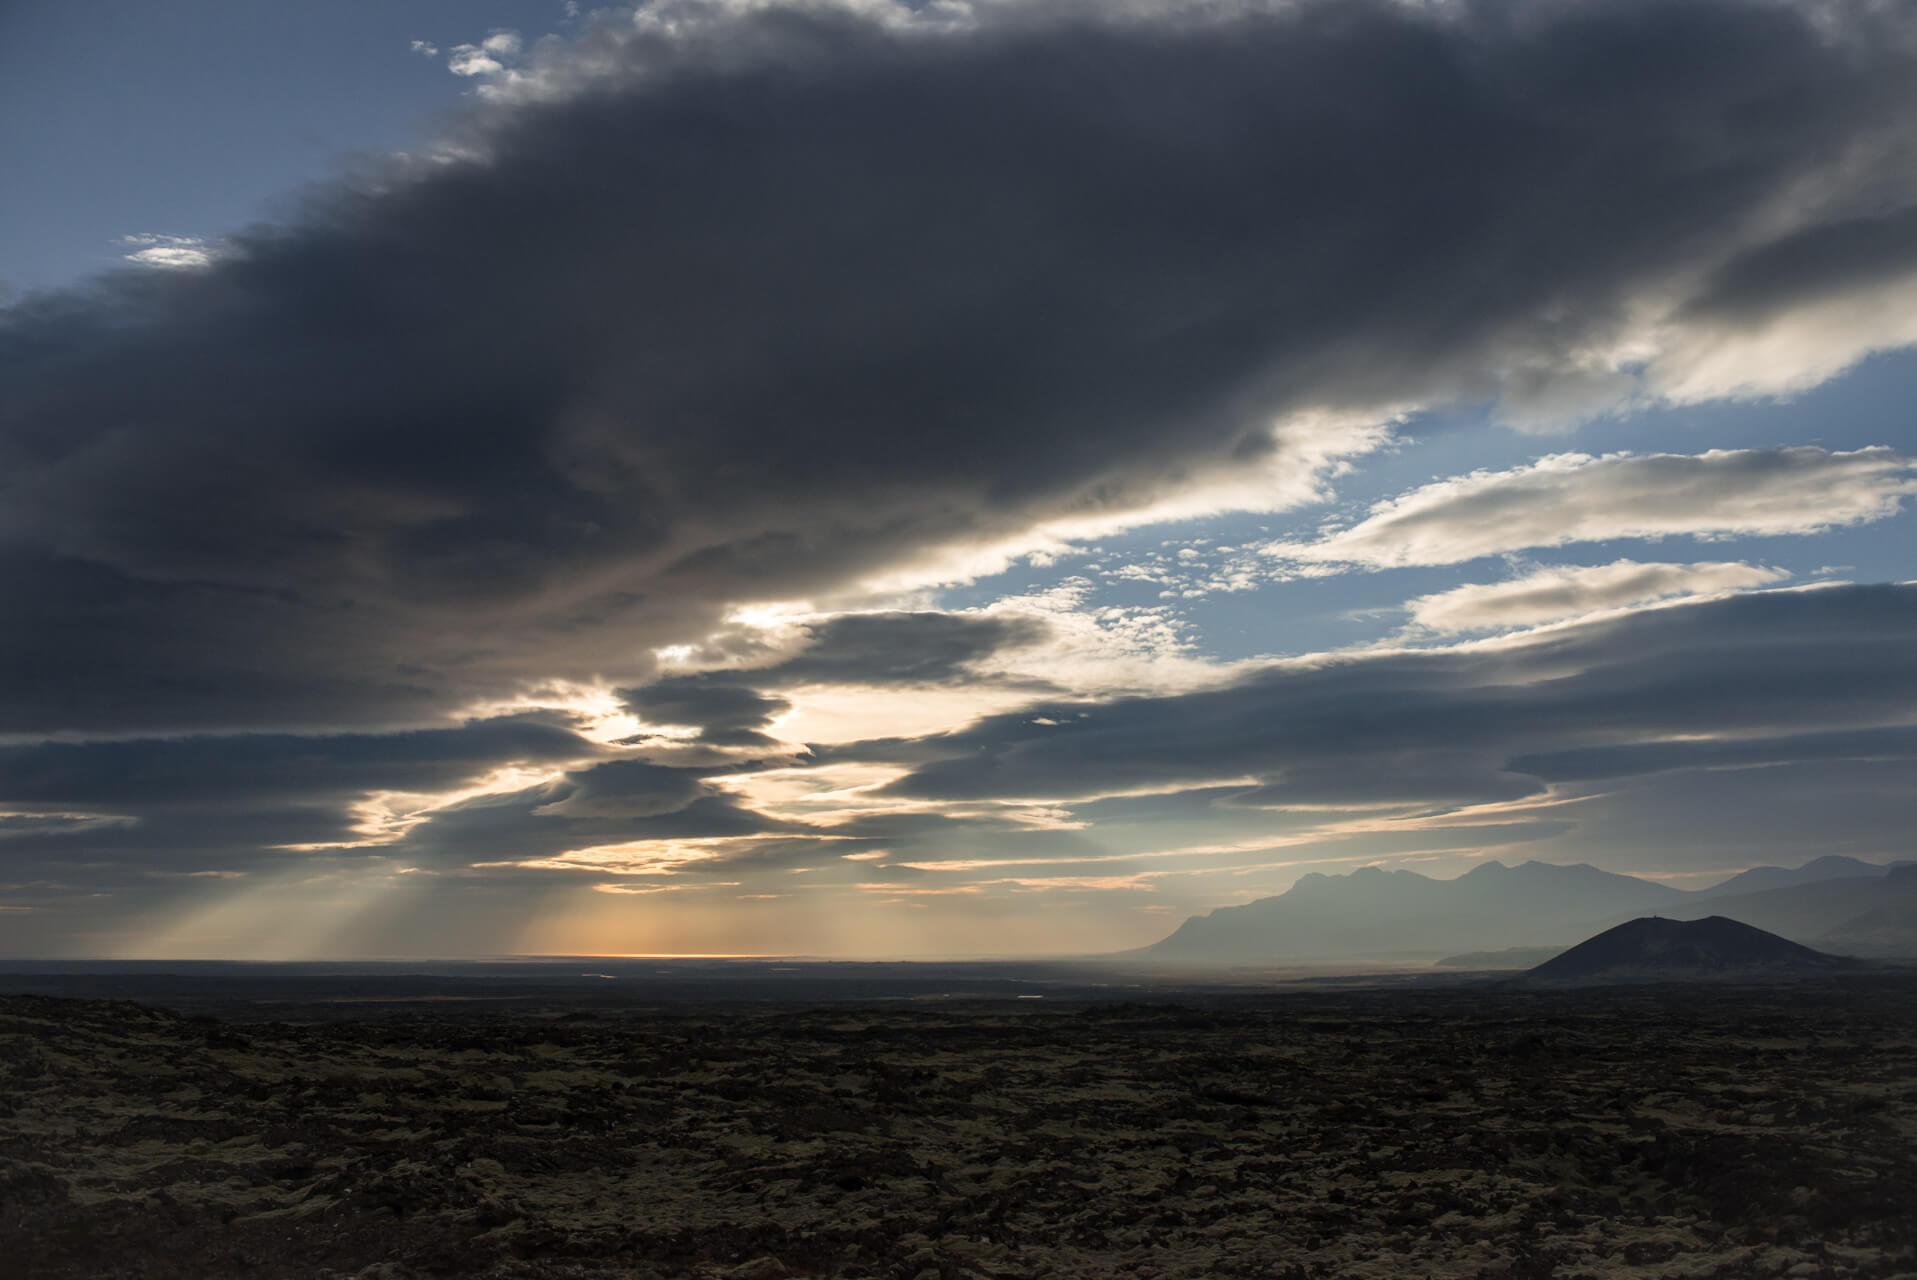 Island, Oktober 2014; Fotograf Steffen Lohse